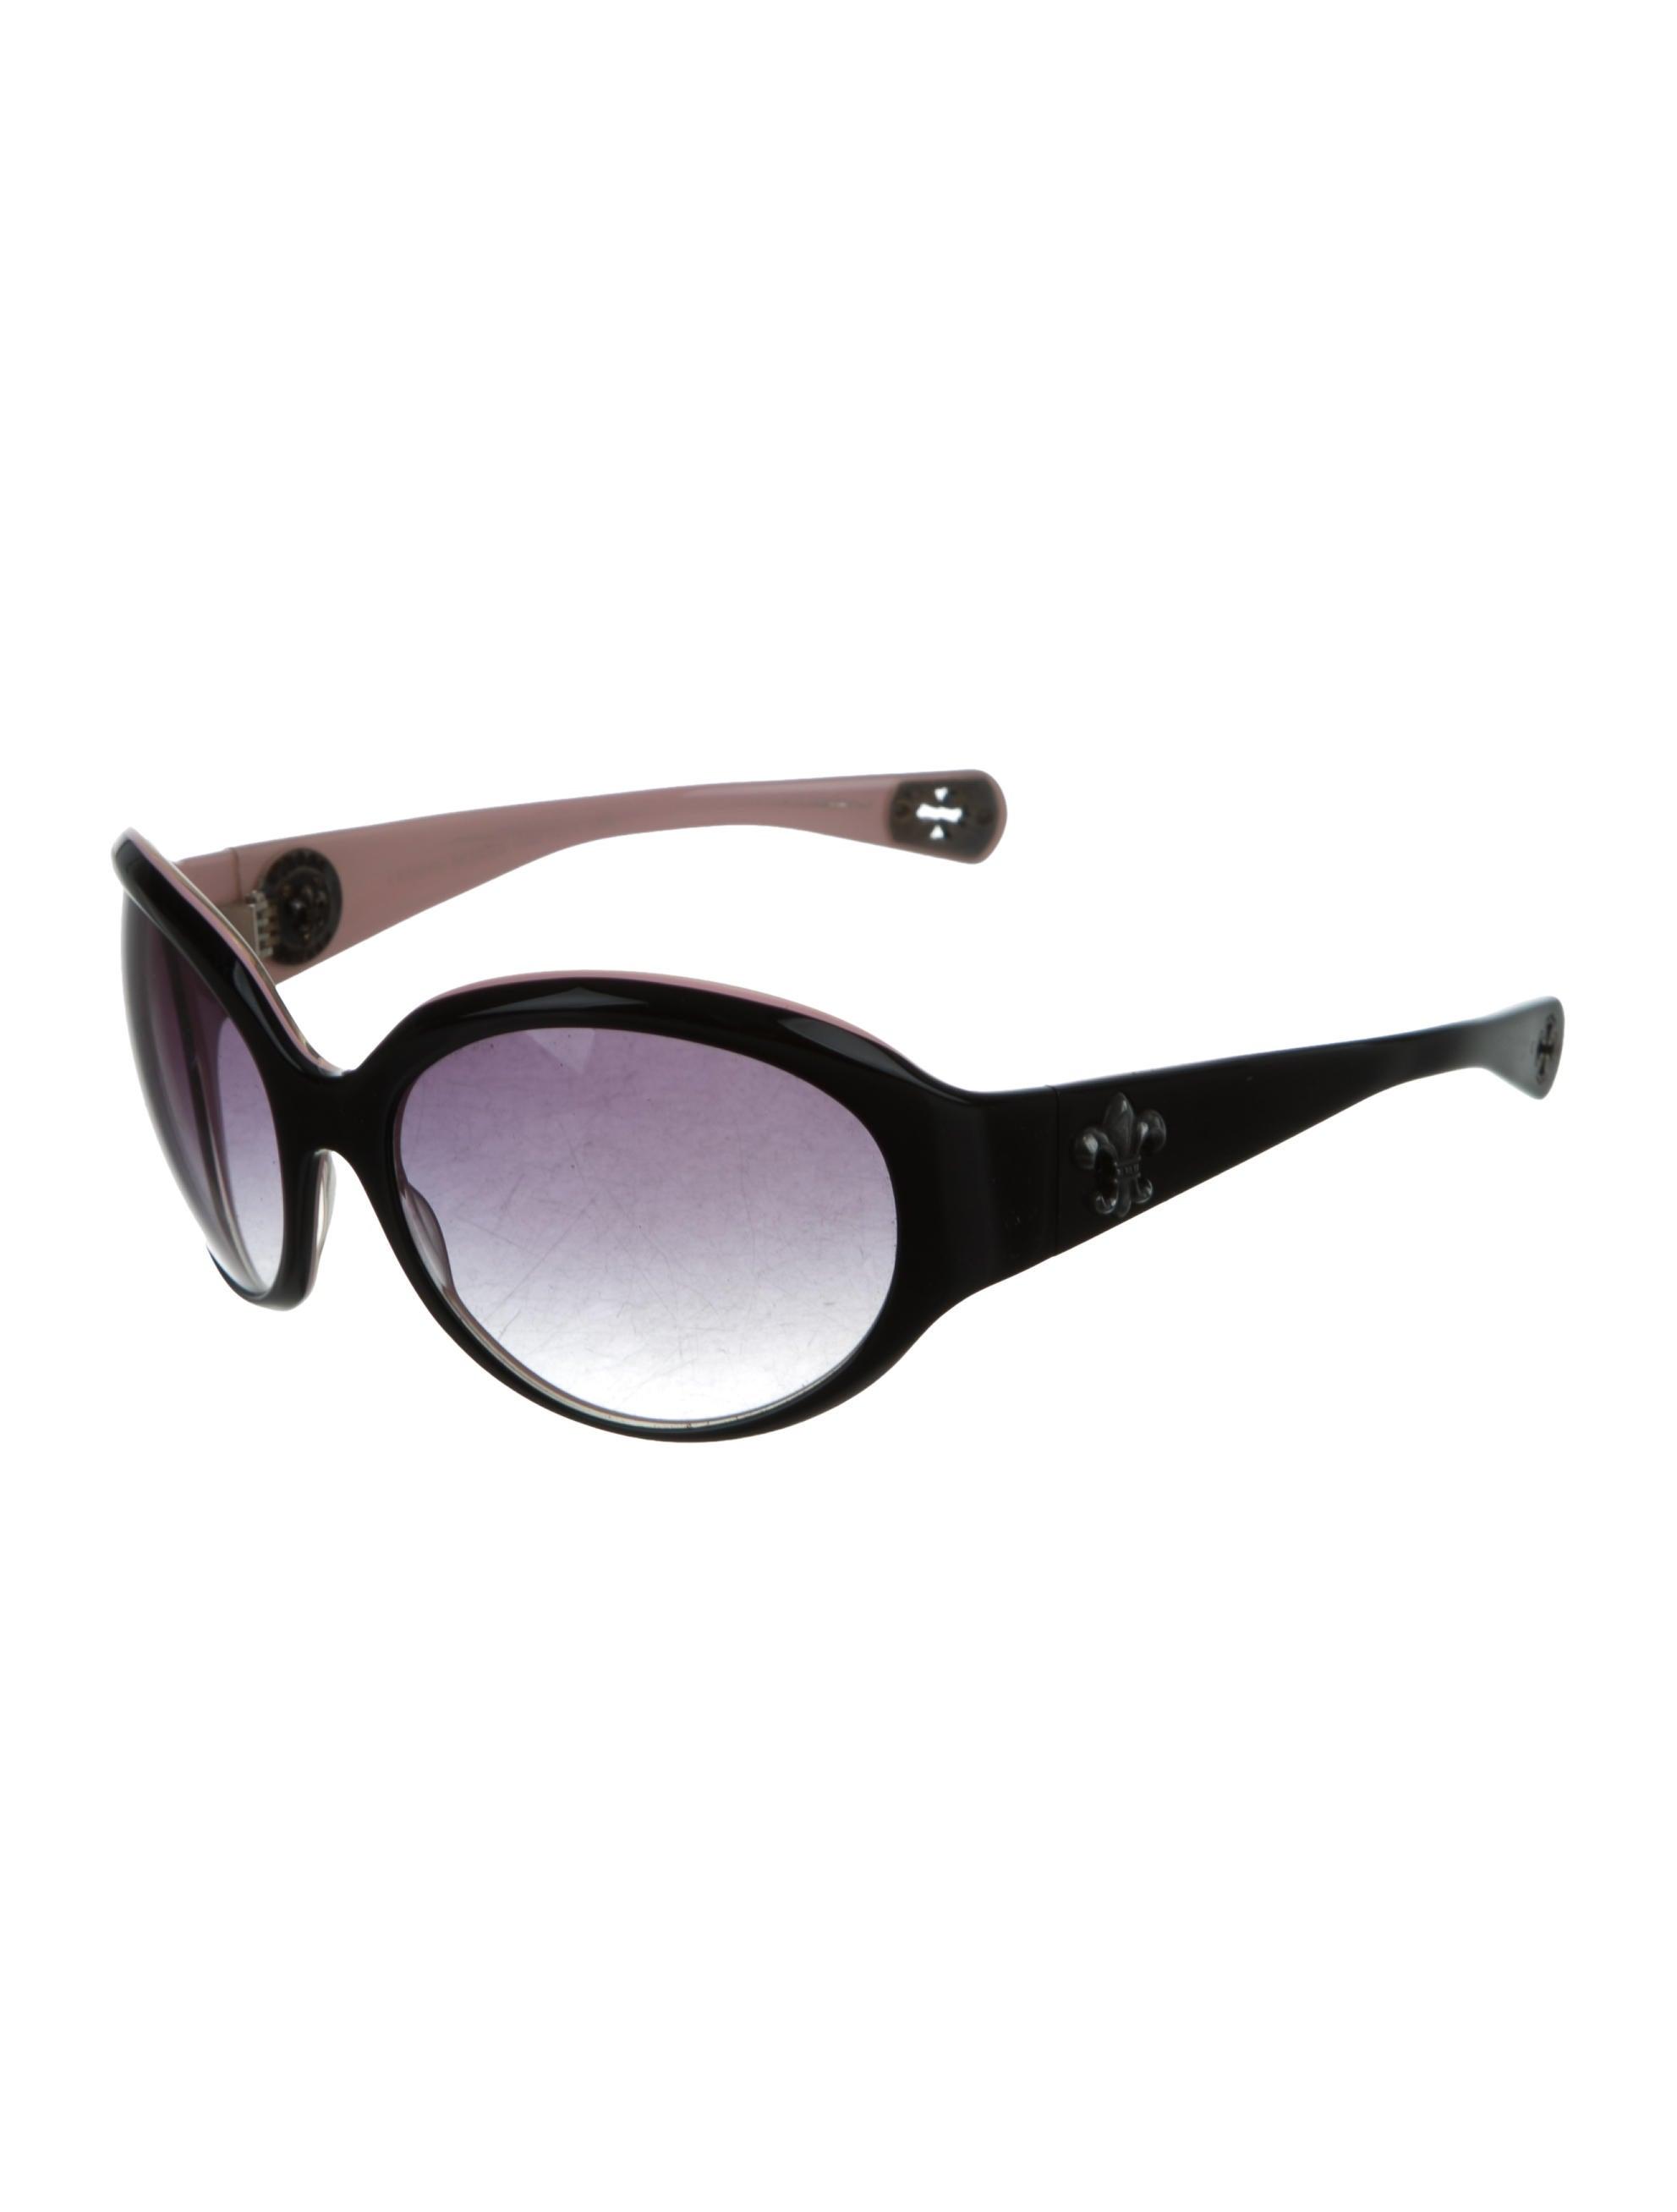 3fca3108721 Chrome Hearts Sunglasses Case